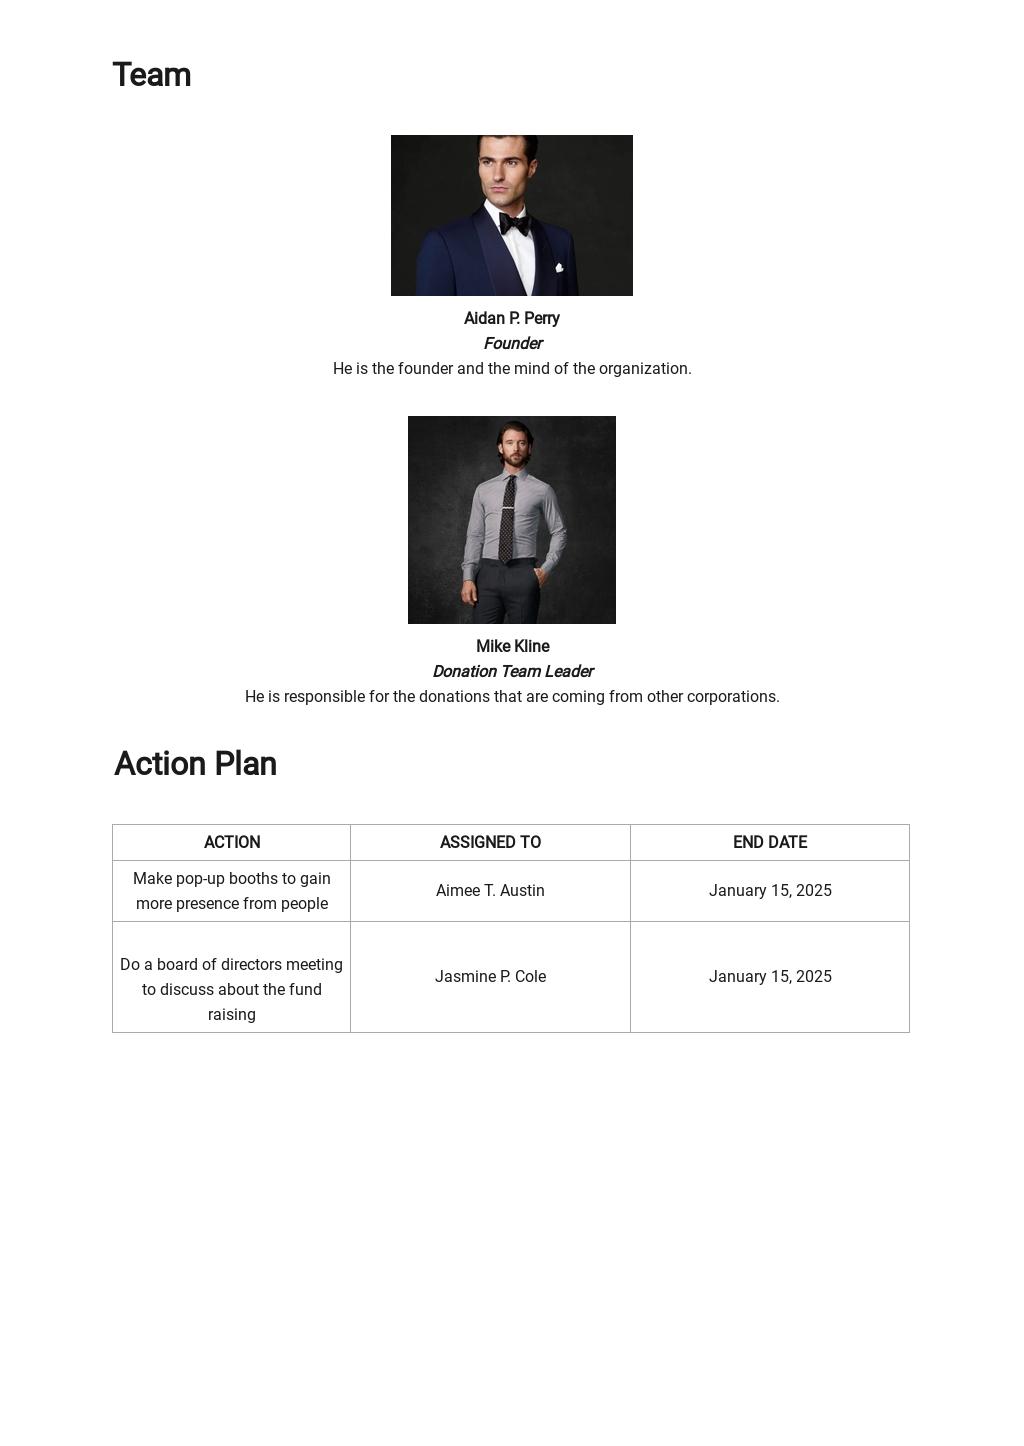 Simple Strategic Plan Template for Nonprofits 3.jpe